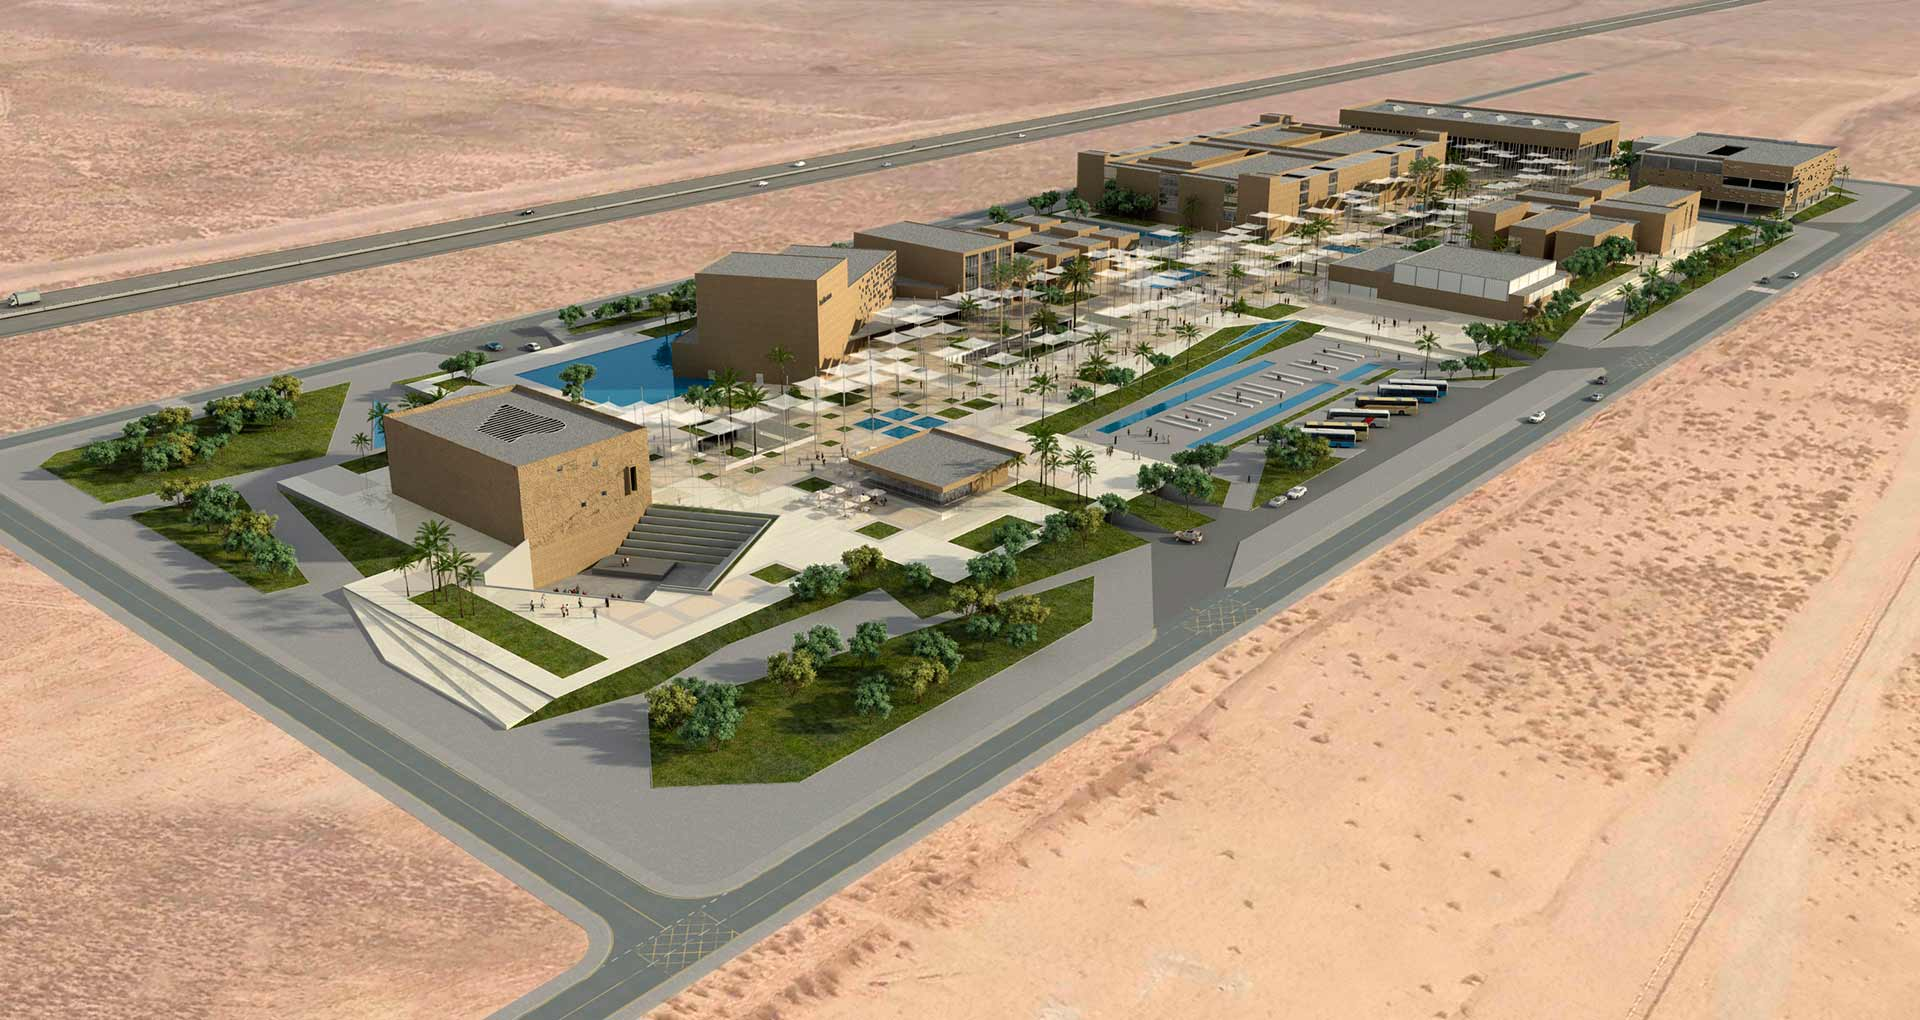 shaikh-khalifa-bin-zayed-institute (3)